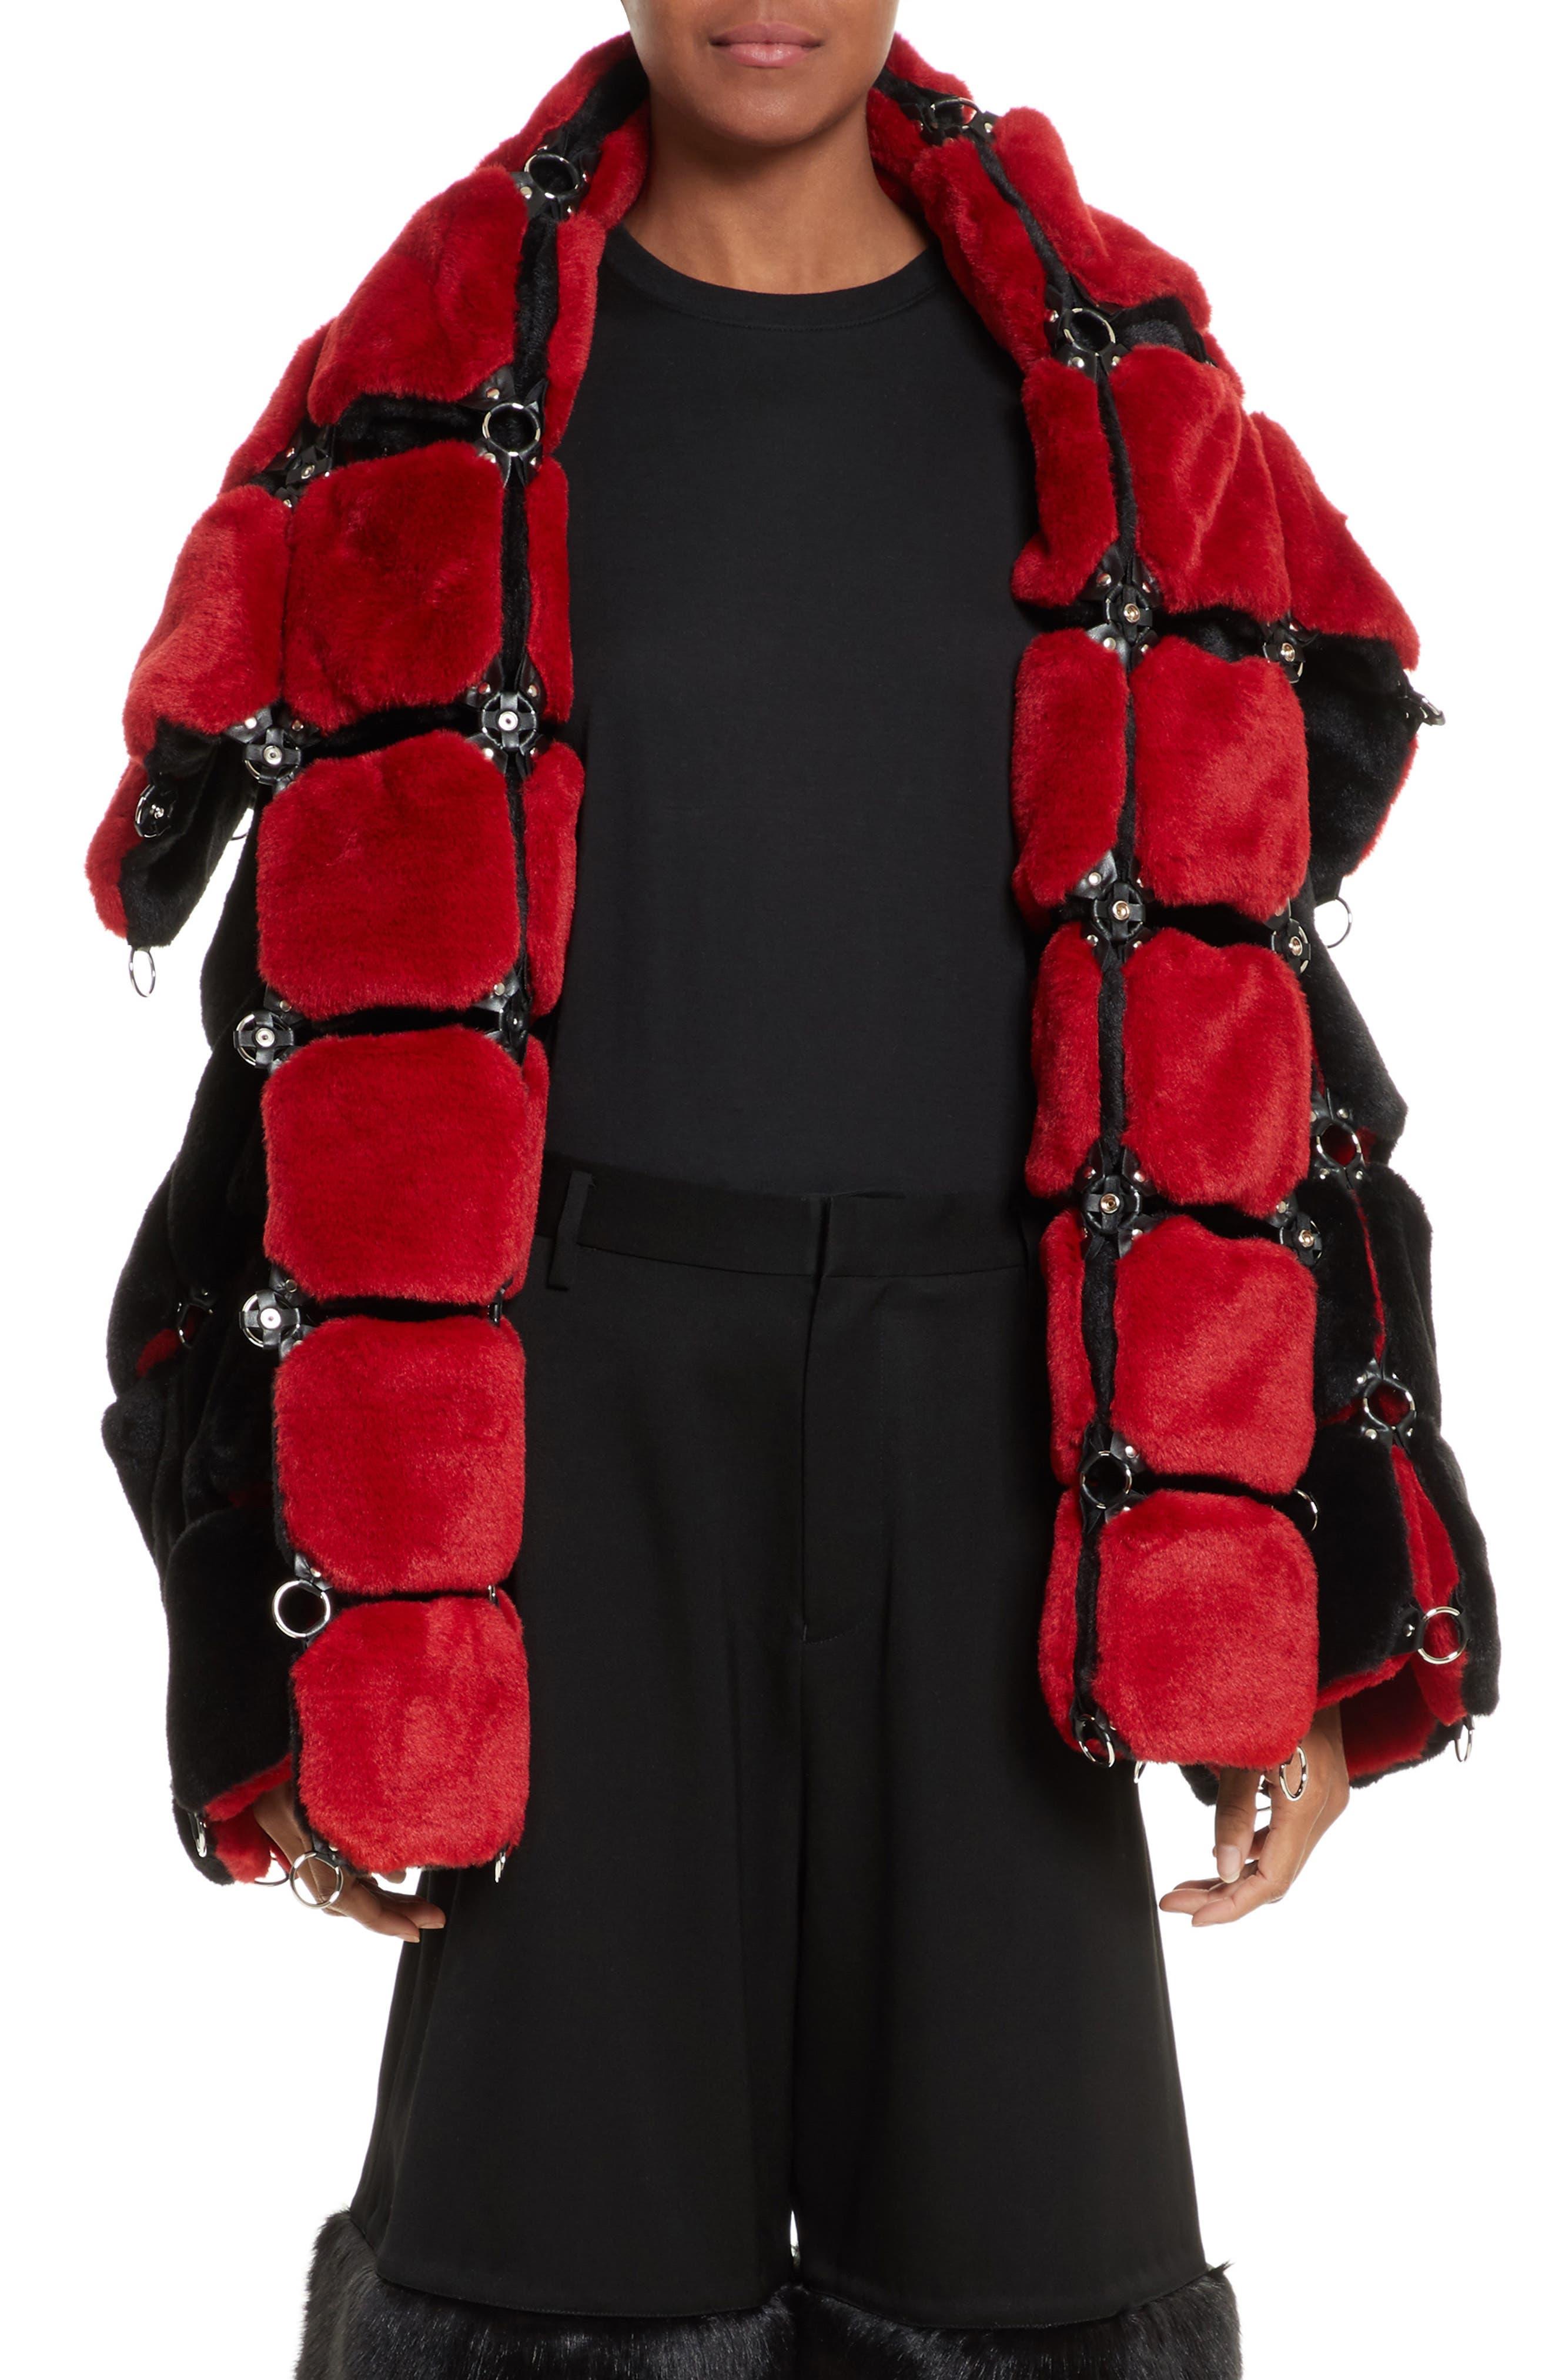 Faux Fur Coat with Chain Mail Detail,                             Main thumbnail 1, color,                             005